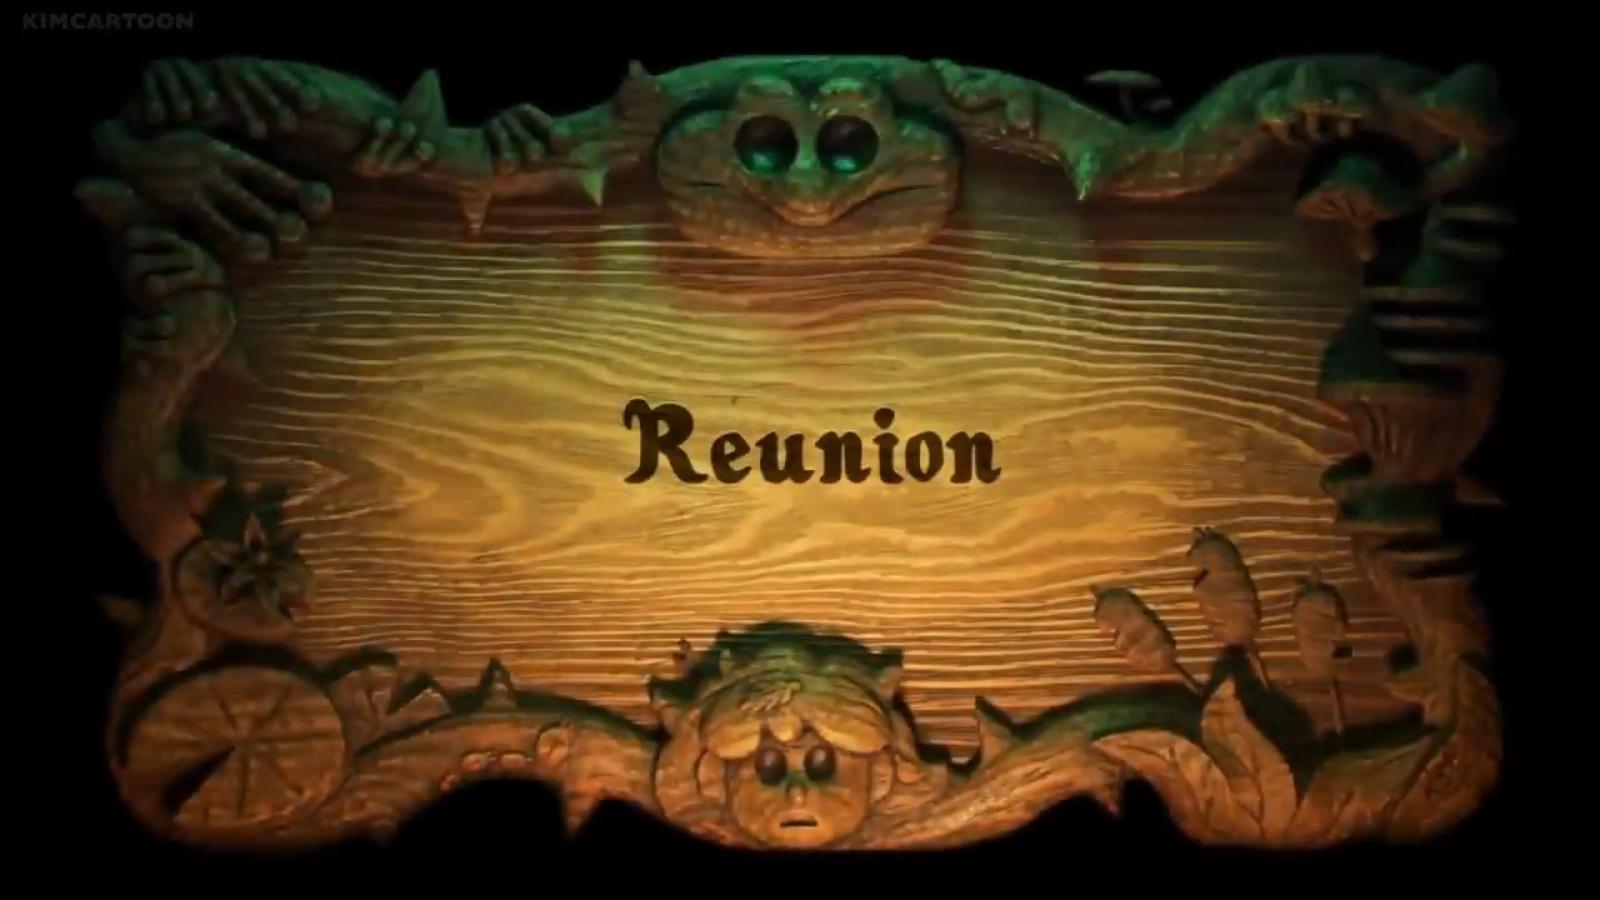 Reunion Amphibia.png